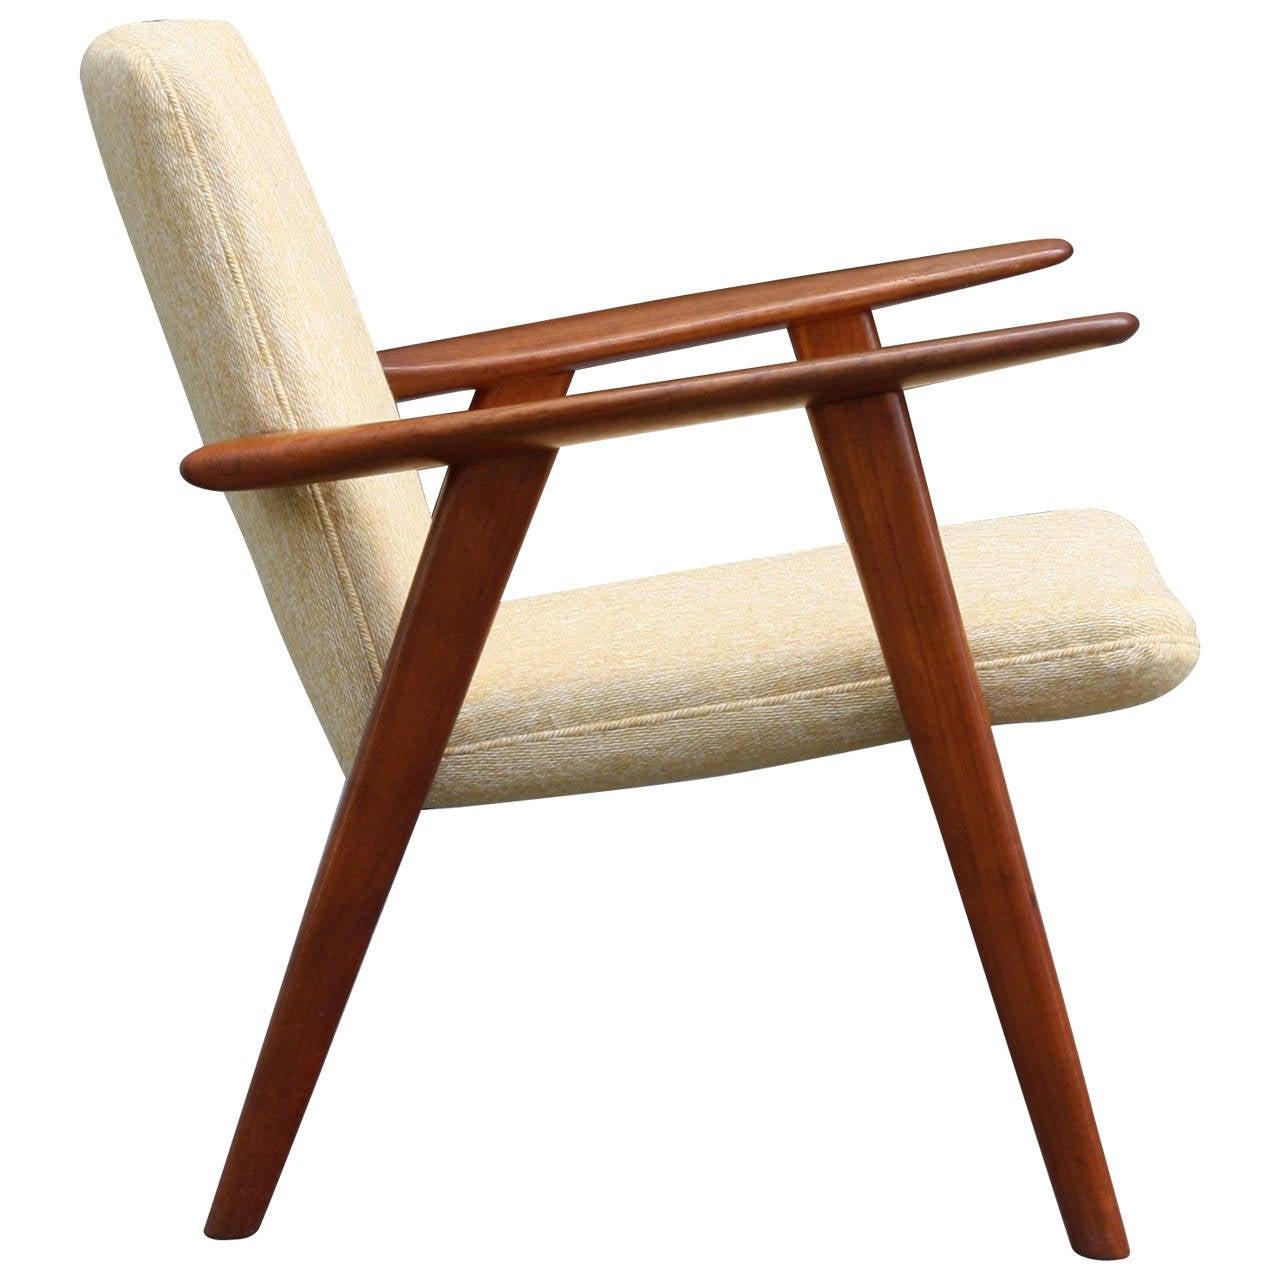 Hans Wegner Rare Early Armchair